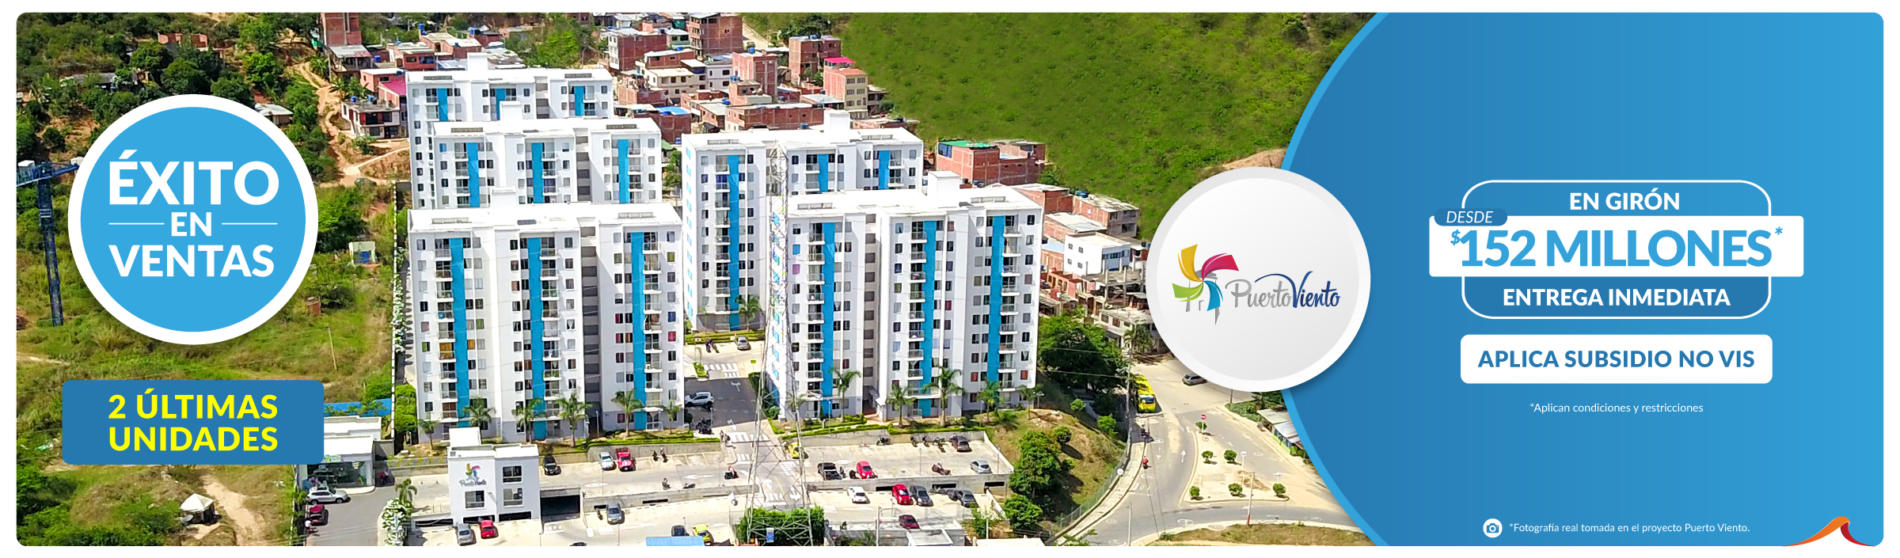 Puerto Viento - apartamentos en Girón - Constructora Grupo Domus